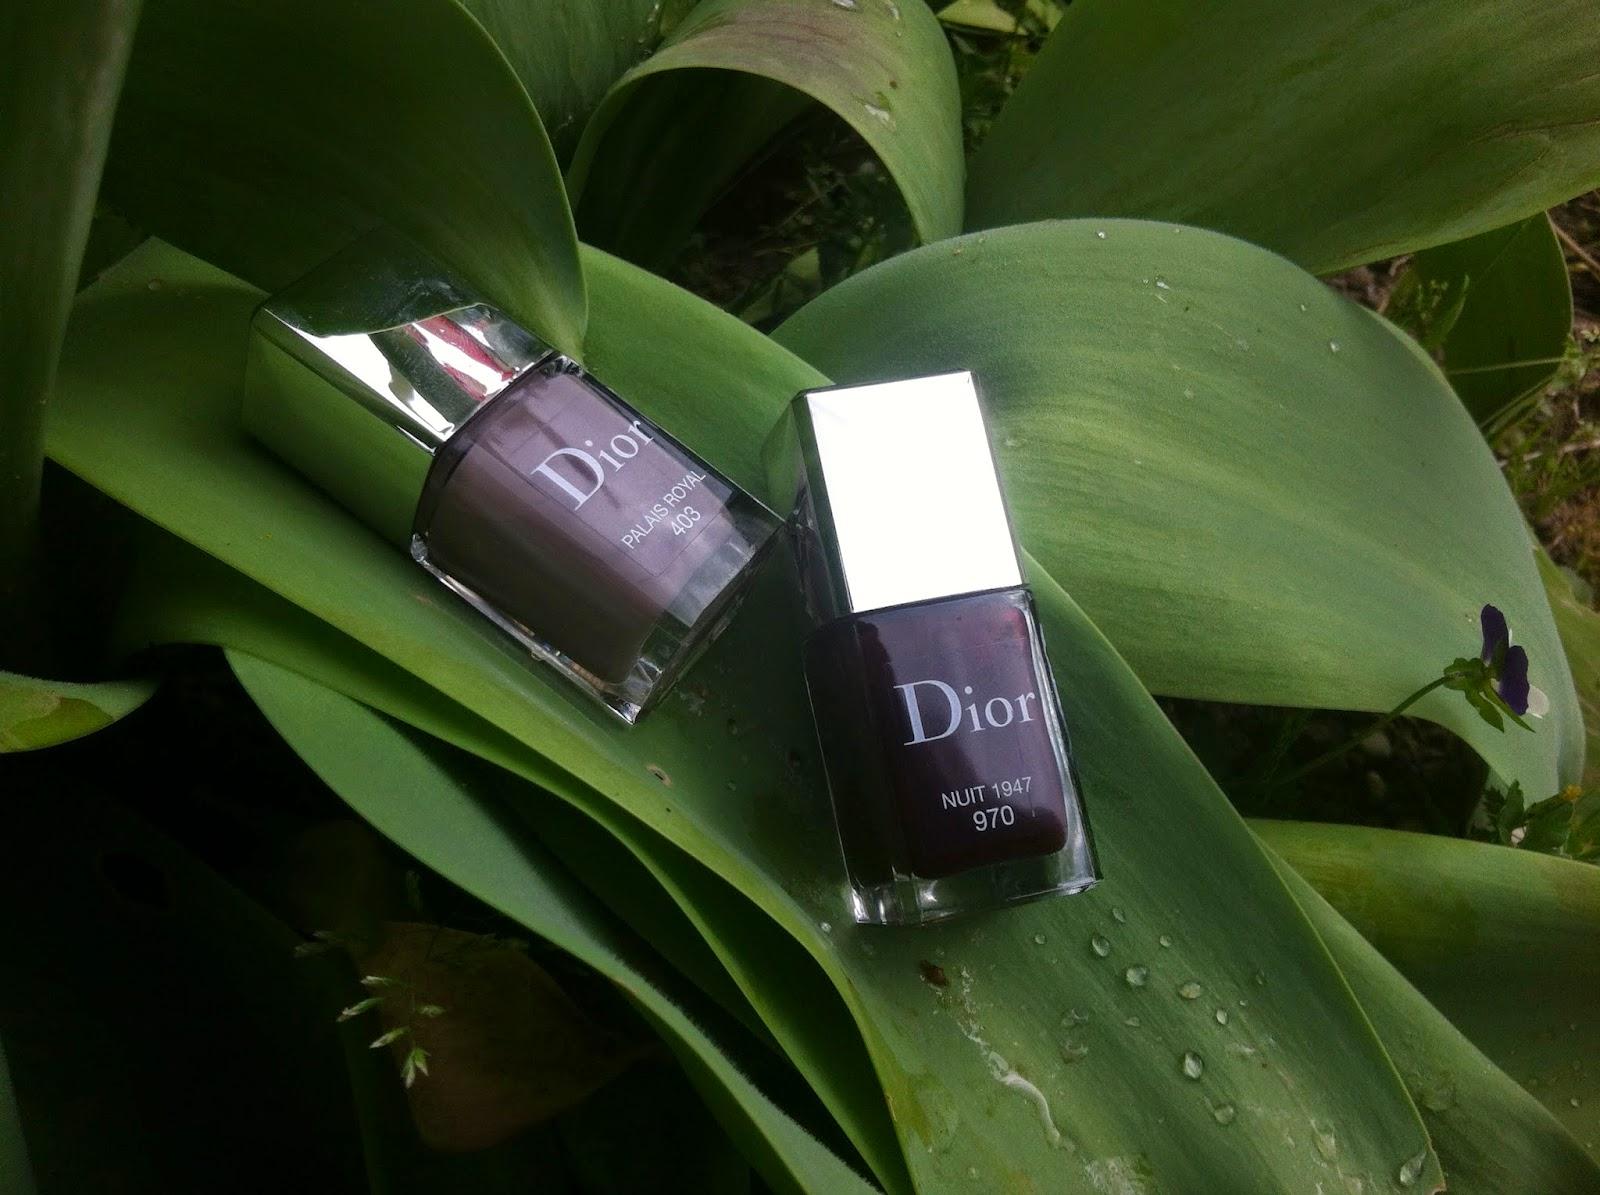 Dior ADDICT Fluid Stick, Dior Vernis 2014, Dior make up primavera 2014, Dior Pandore, Dior Mirage, Dior Wonderland, Dior Aventure, Dior nuit 1947, dior palais royal